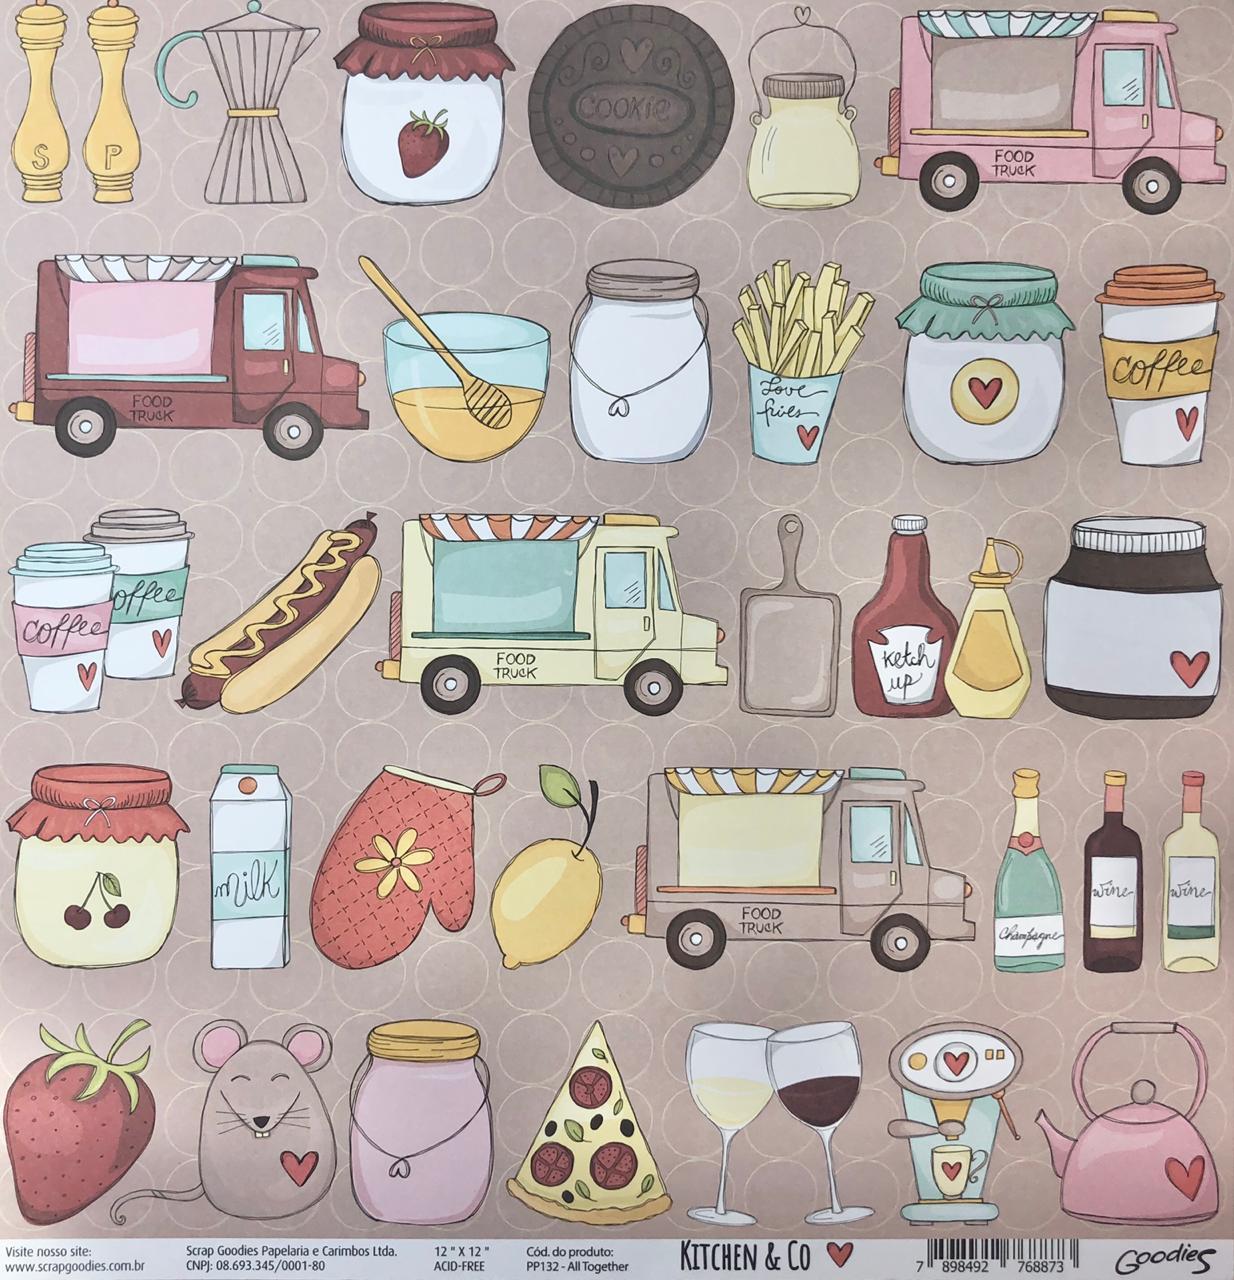 Papel Scrap - All Together - Coleção Kitchen & Co - Goodies (PP132)